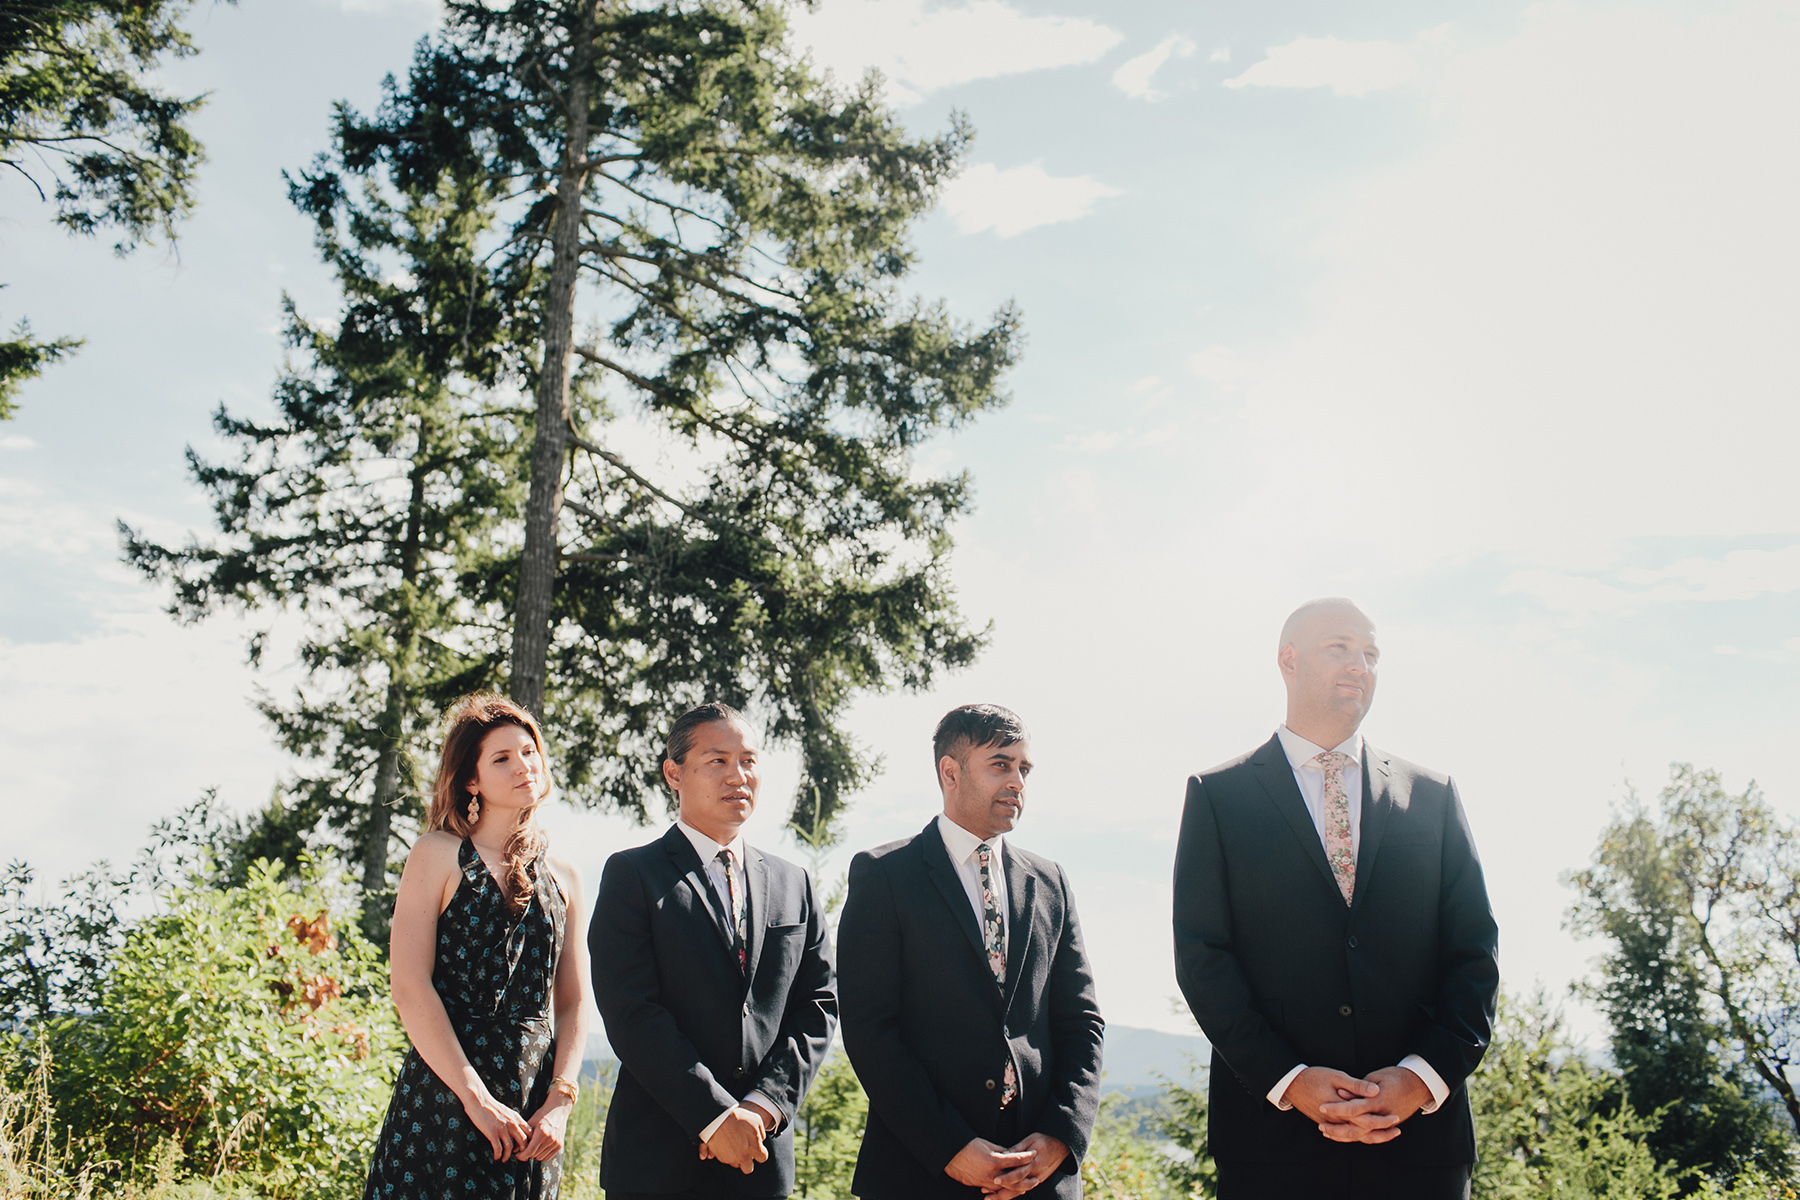 bodega-ridge-wedding-photos-0076.jpg